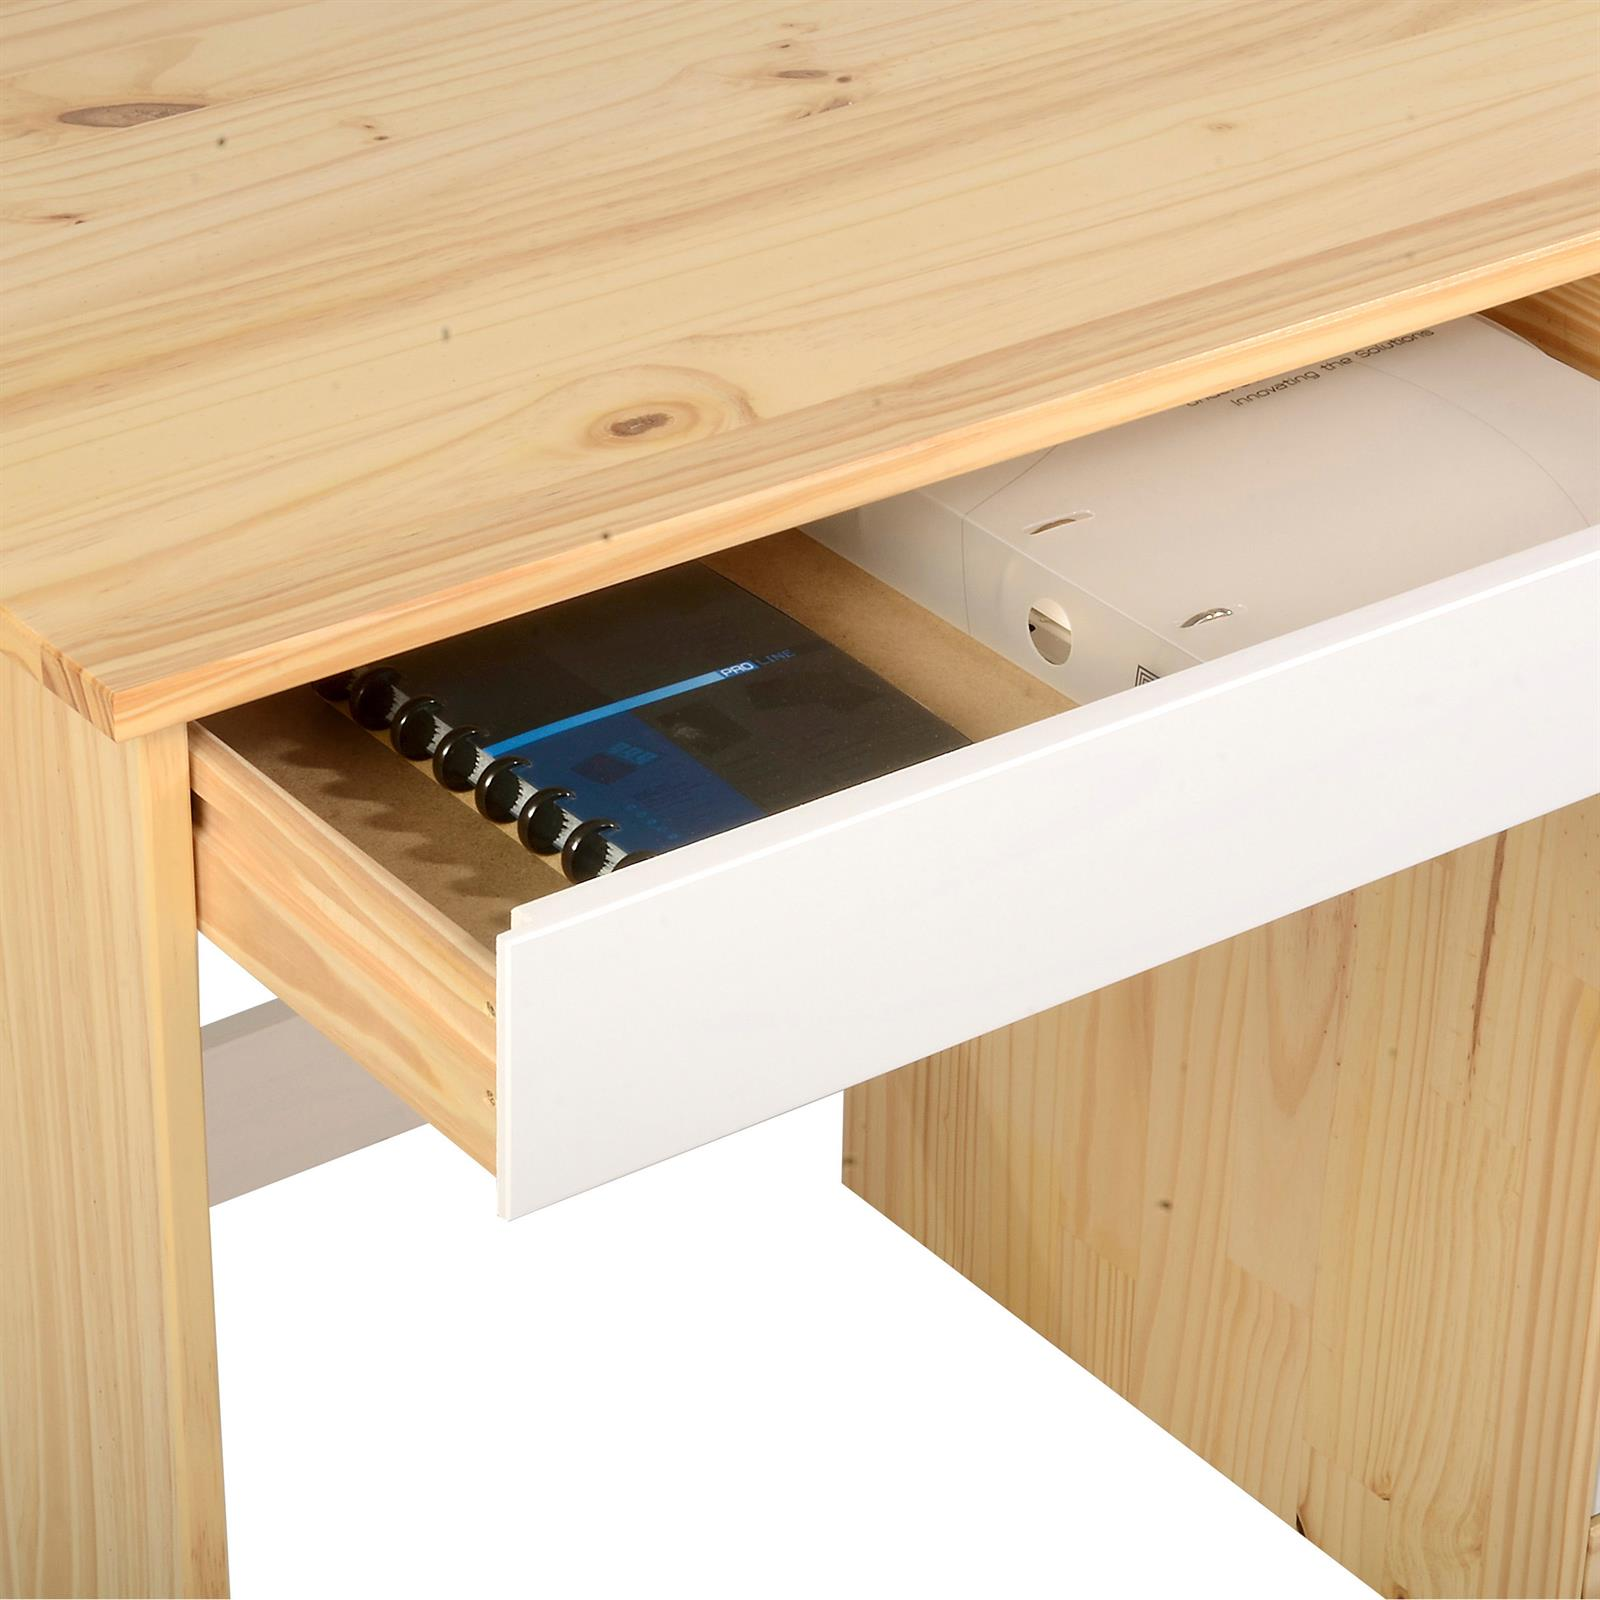 schreibtisch hugo in kiefer massiv natur wei mobilia24. Black Bedroom Furniture Sets. Home Design Ideas